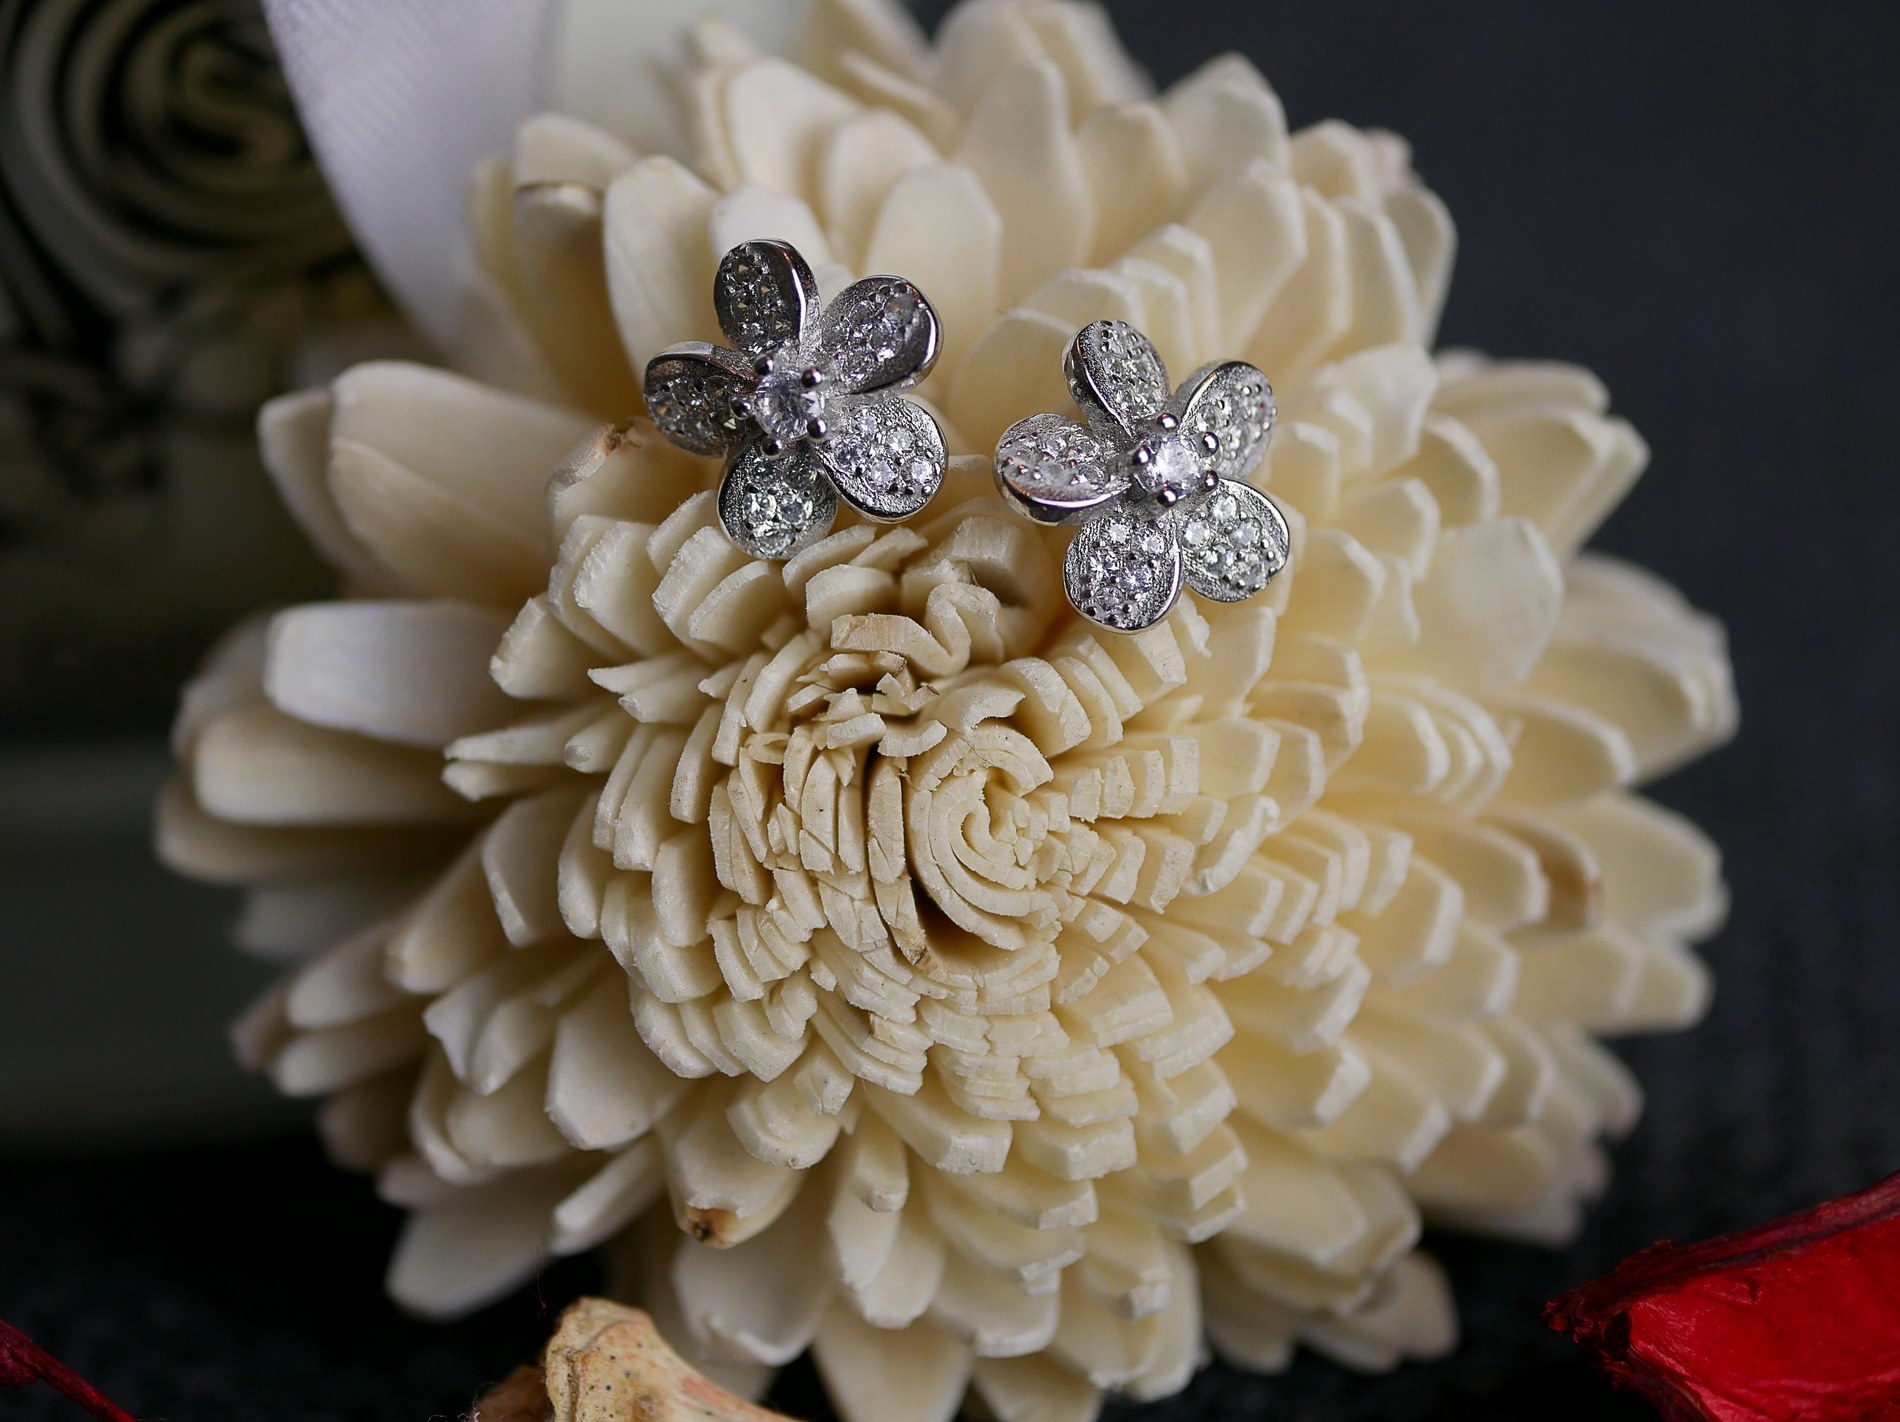 boucles d'oreilles jewelcandle - juliesliberties